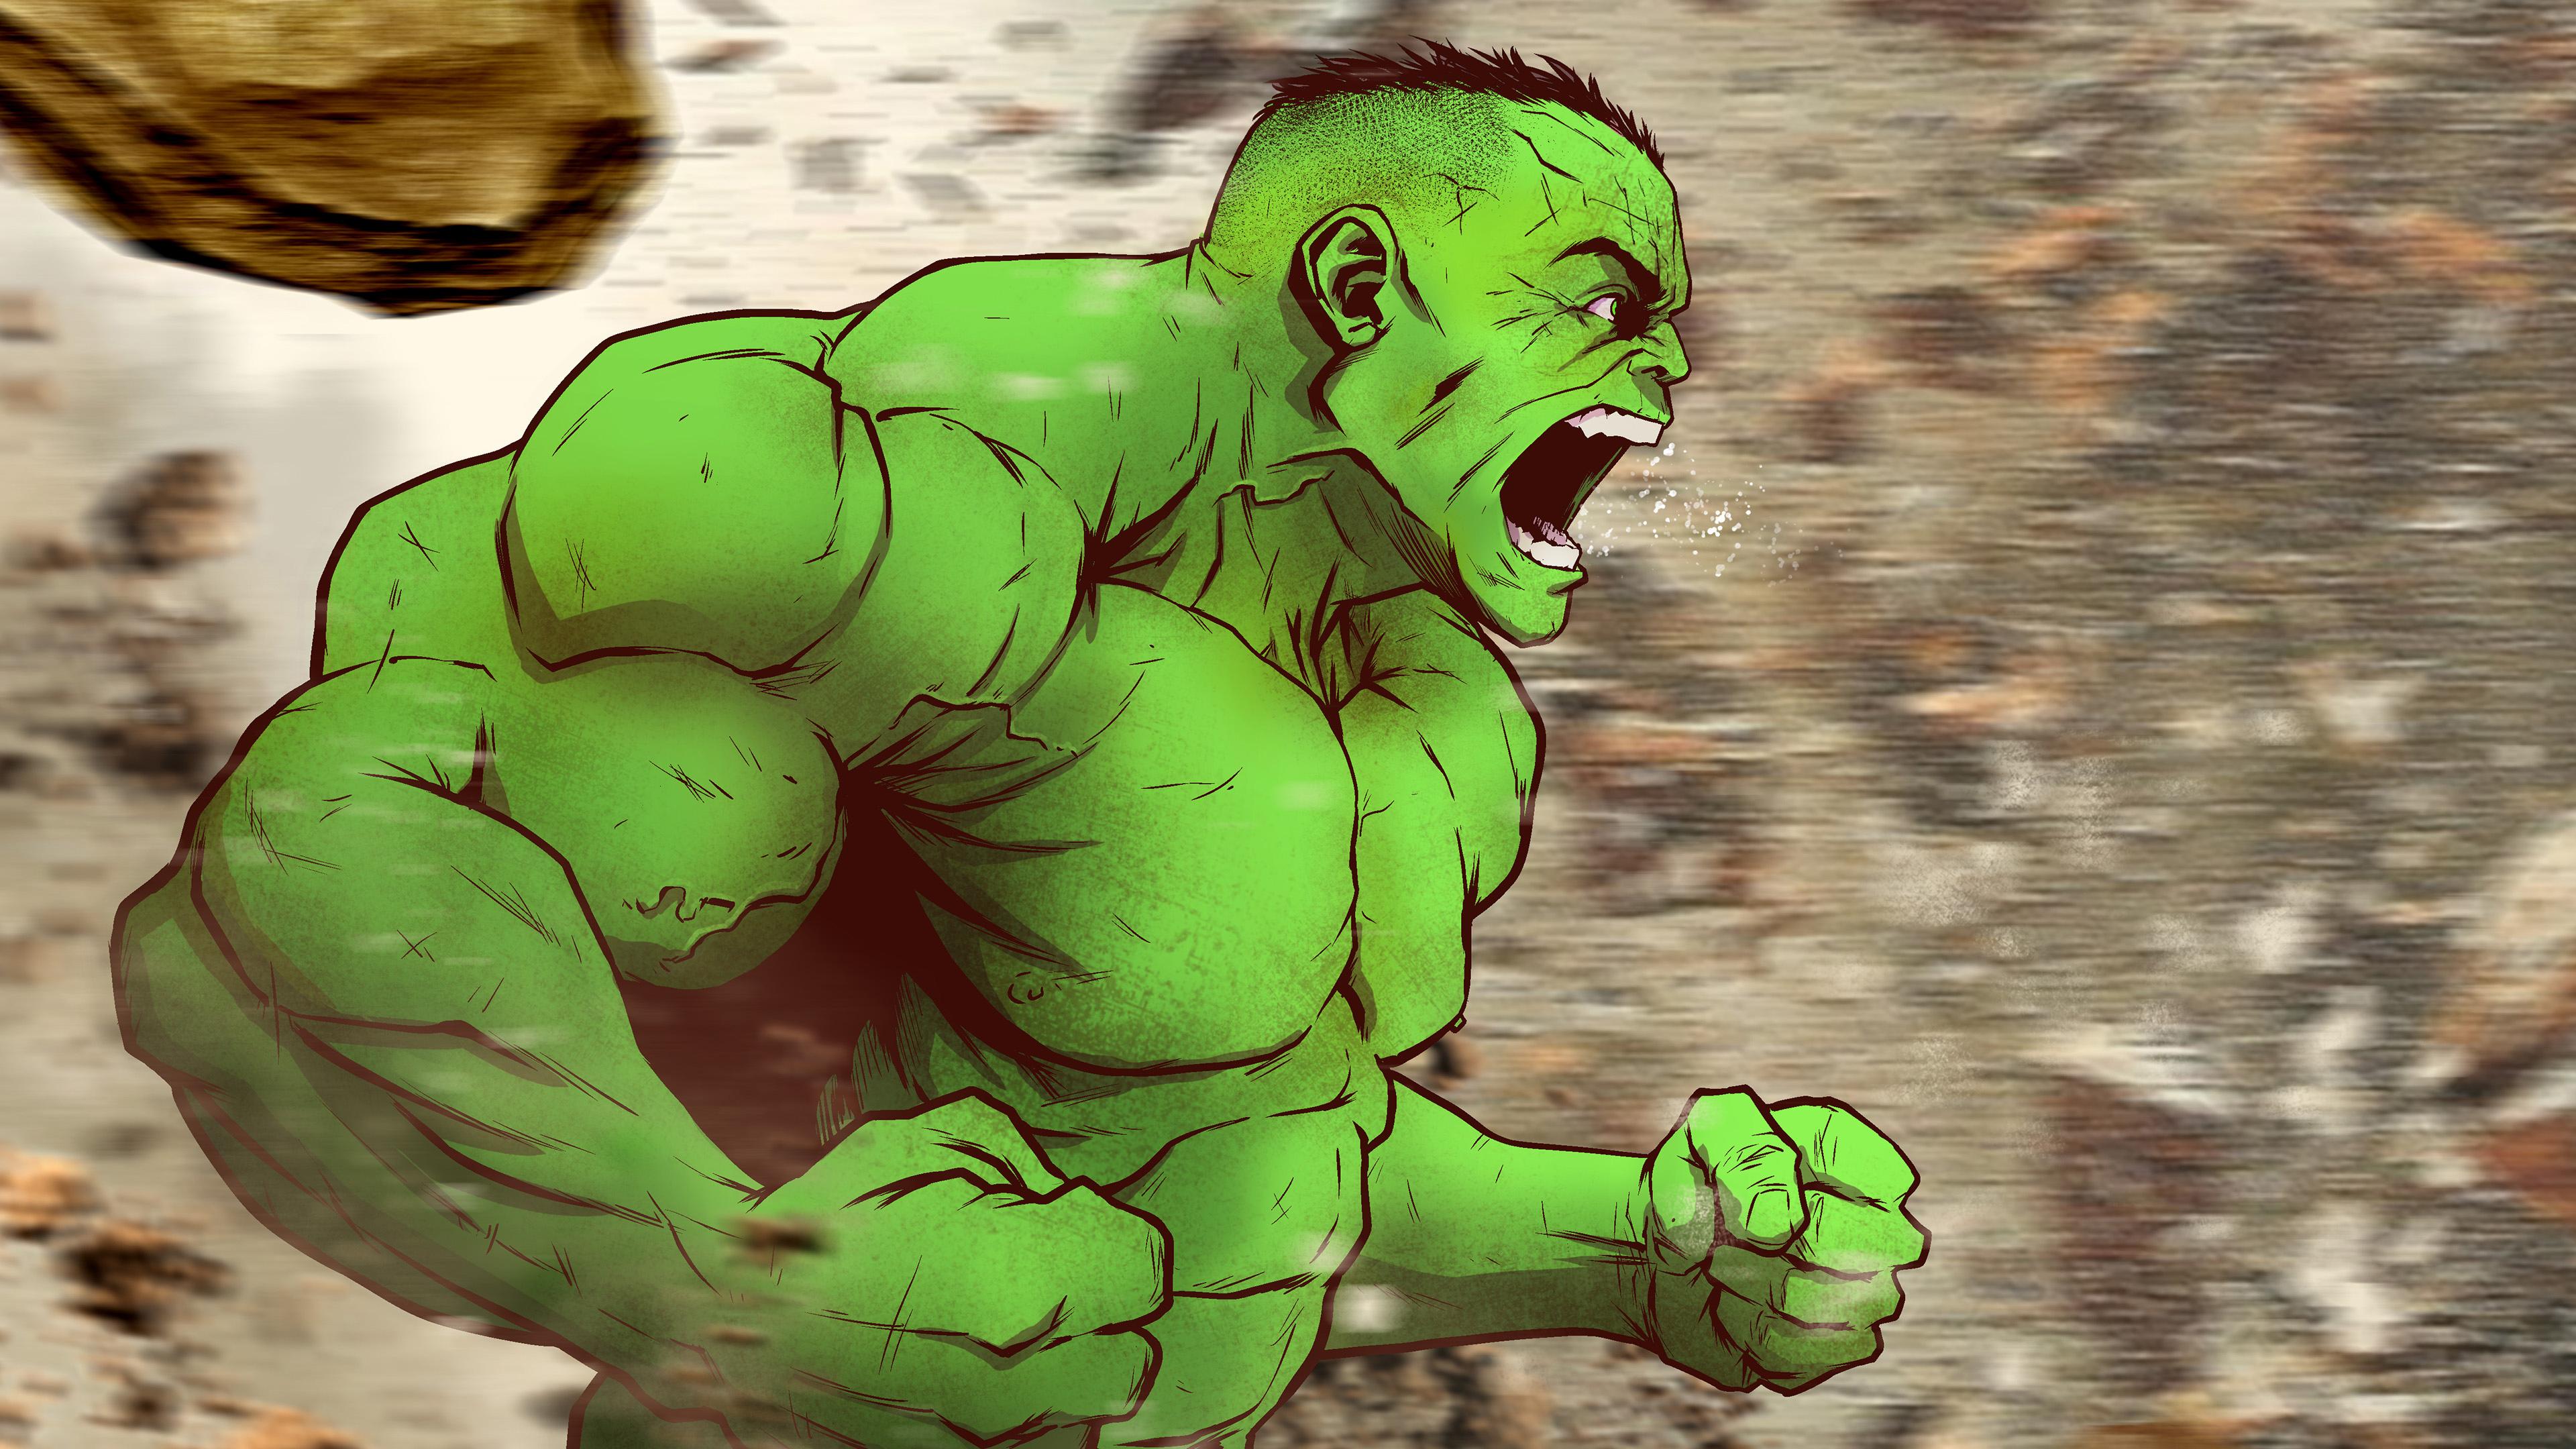 hulk 4k arts 1547936489 - Hulk 4k Arts - superheroes wallpapers, hulk wallpapers, hd-wallpapers, digital art wallpapers, behance wallpapers, artwork wallpapers, 4k-wallpapers